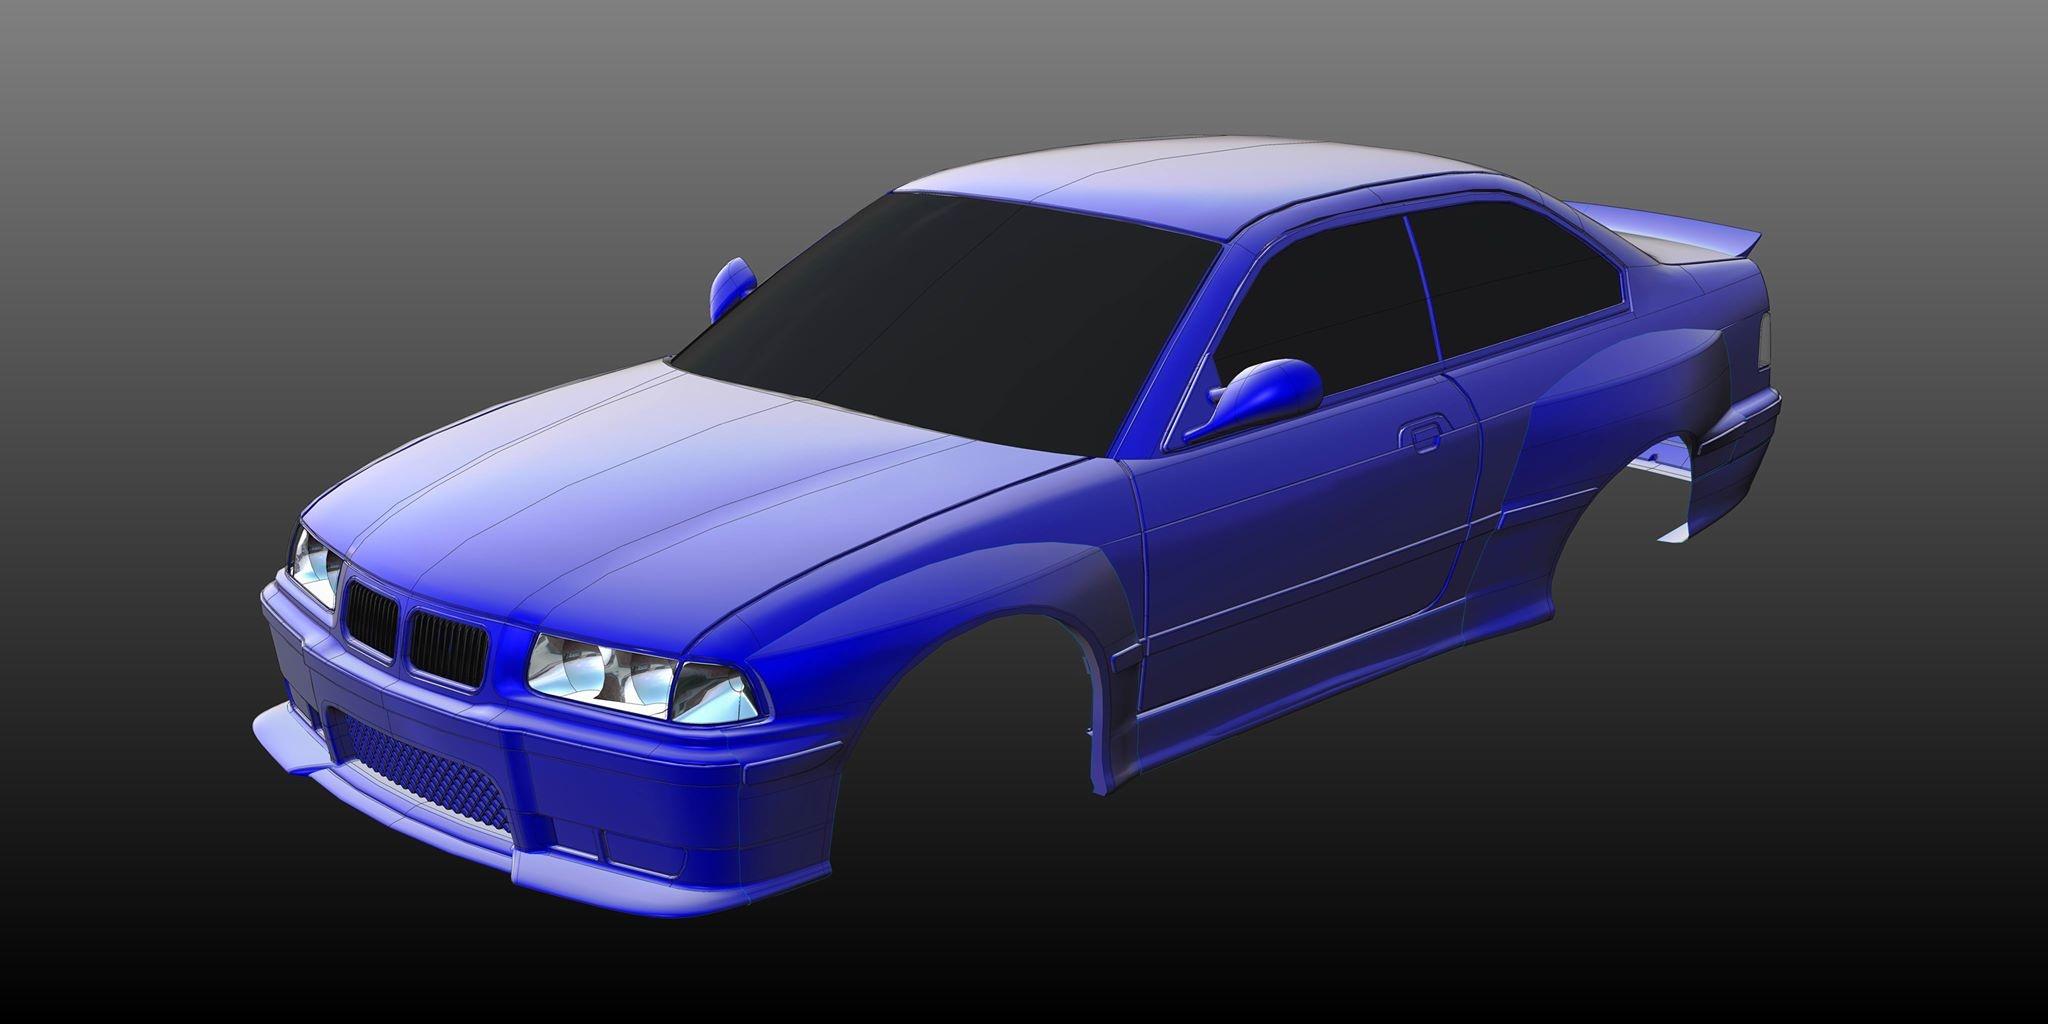 Rc Arlos - RC-E36M3WBK - Wide Body Kit for BMW M3 (E36 ...